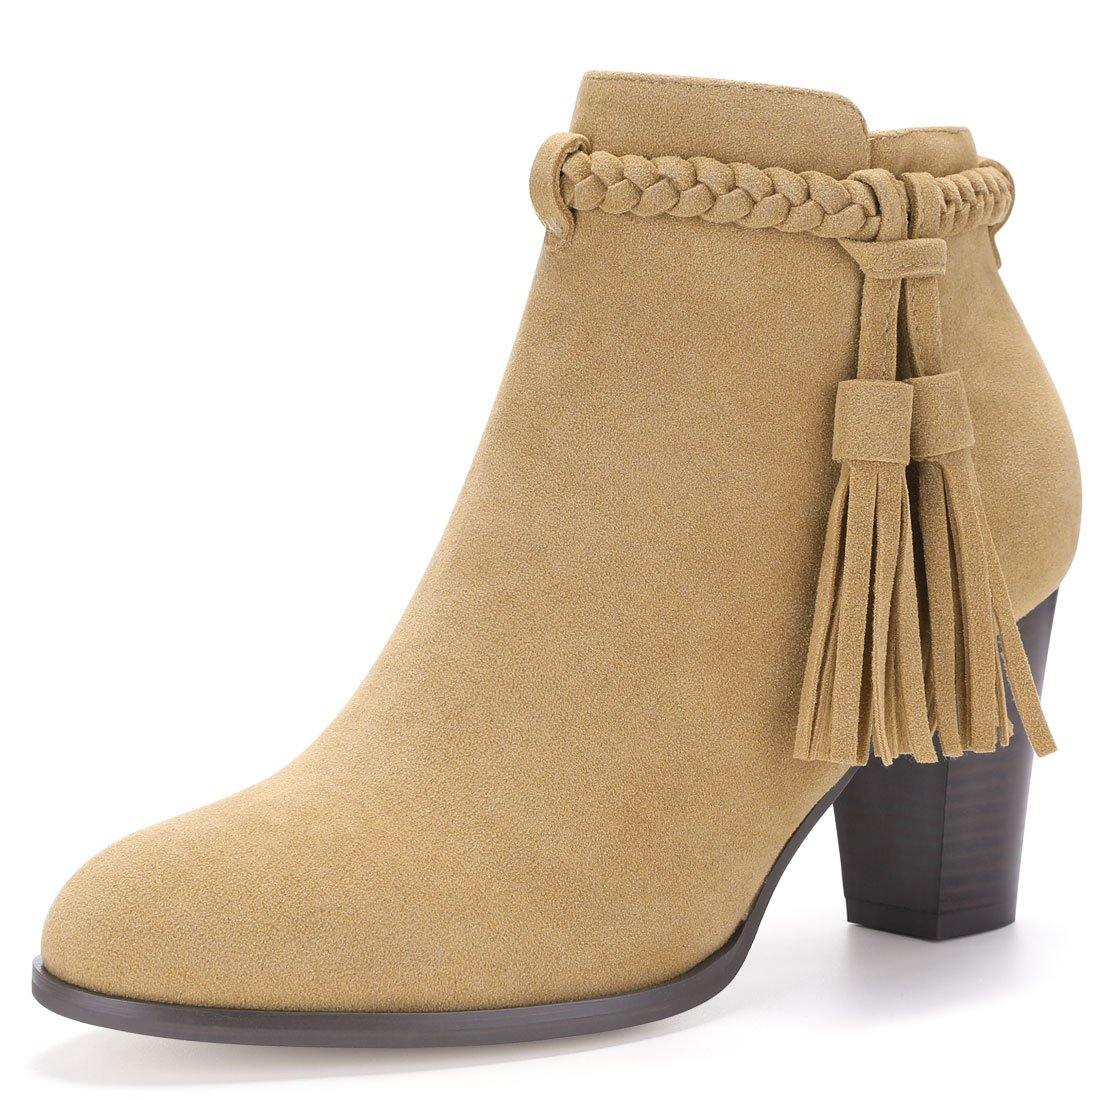 Allegra K Women's Braided Tassel Block Heel Bootie a17071700ux1373